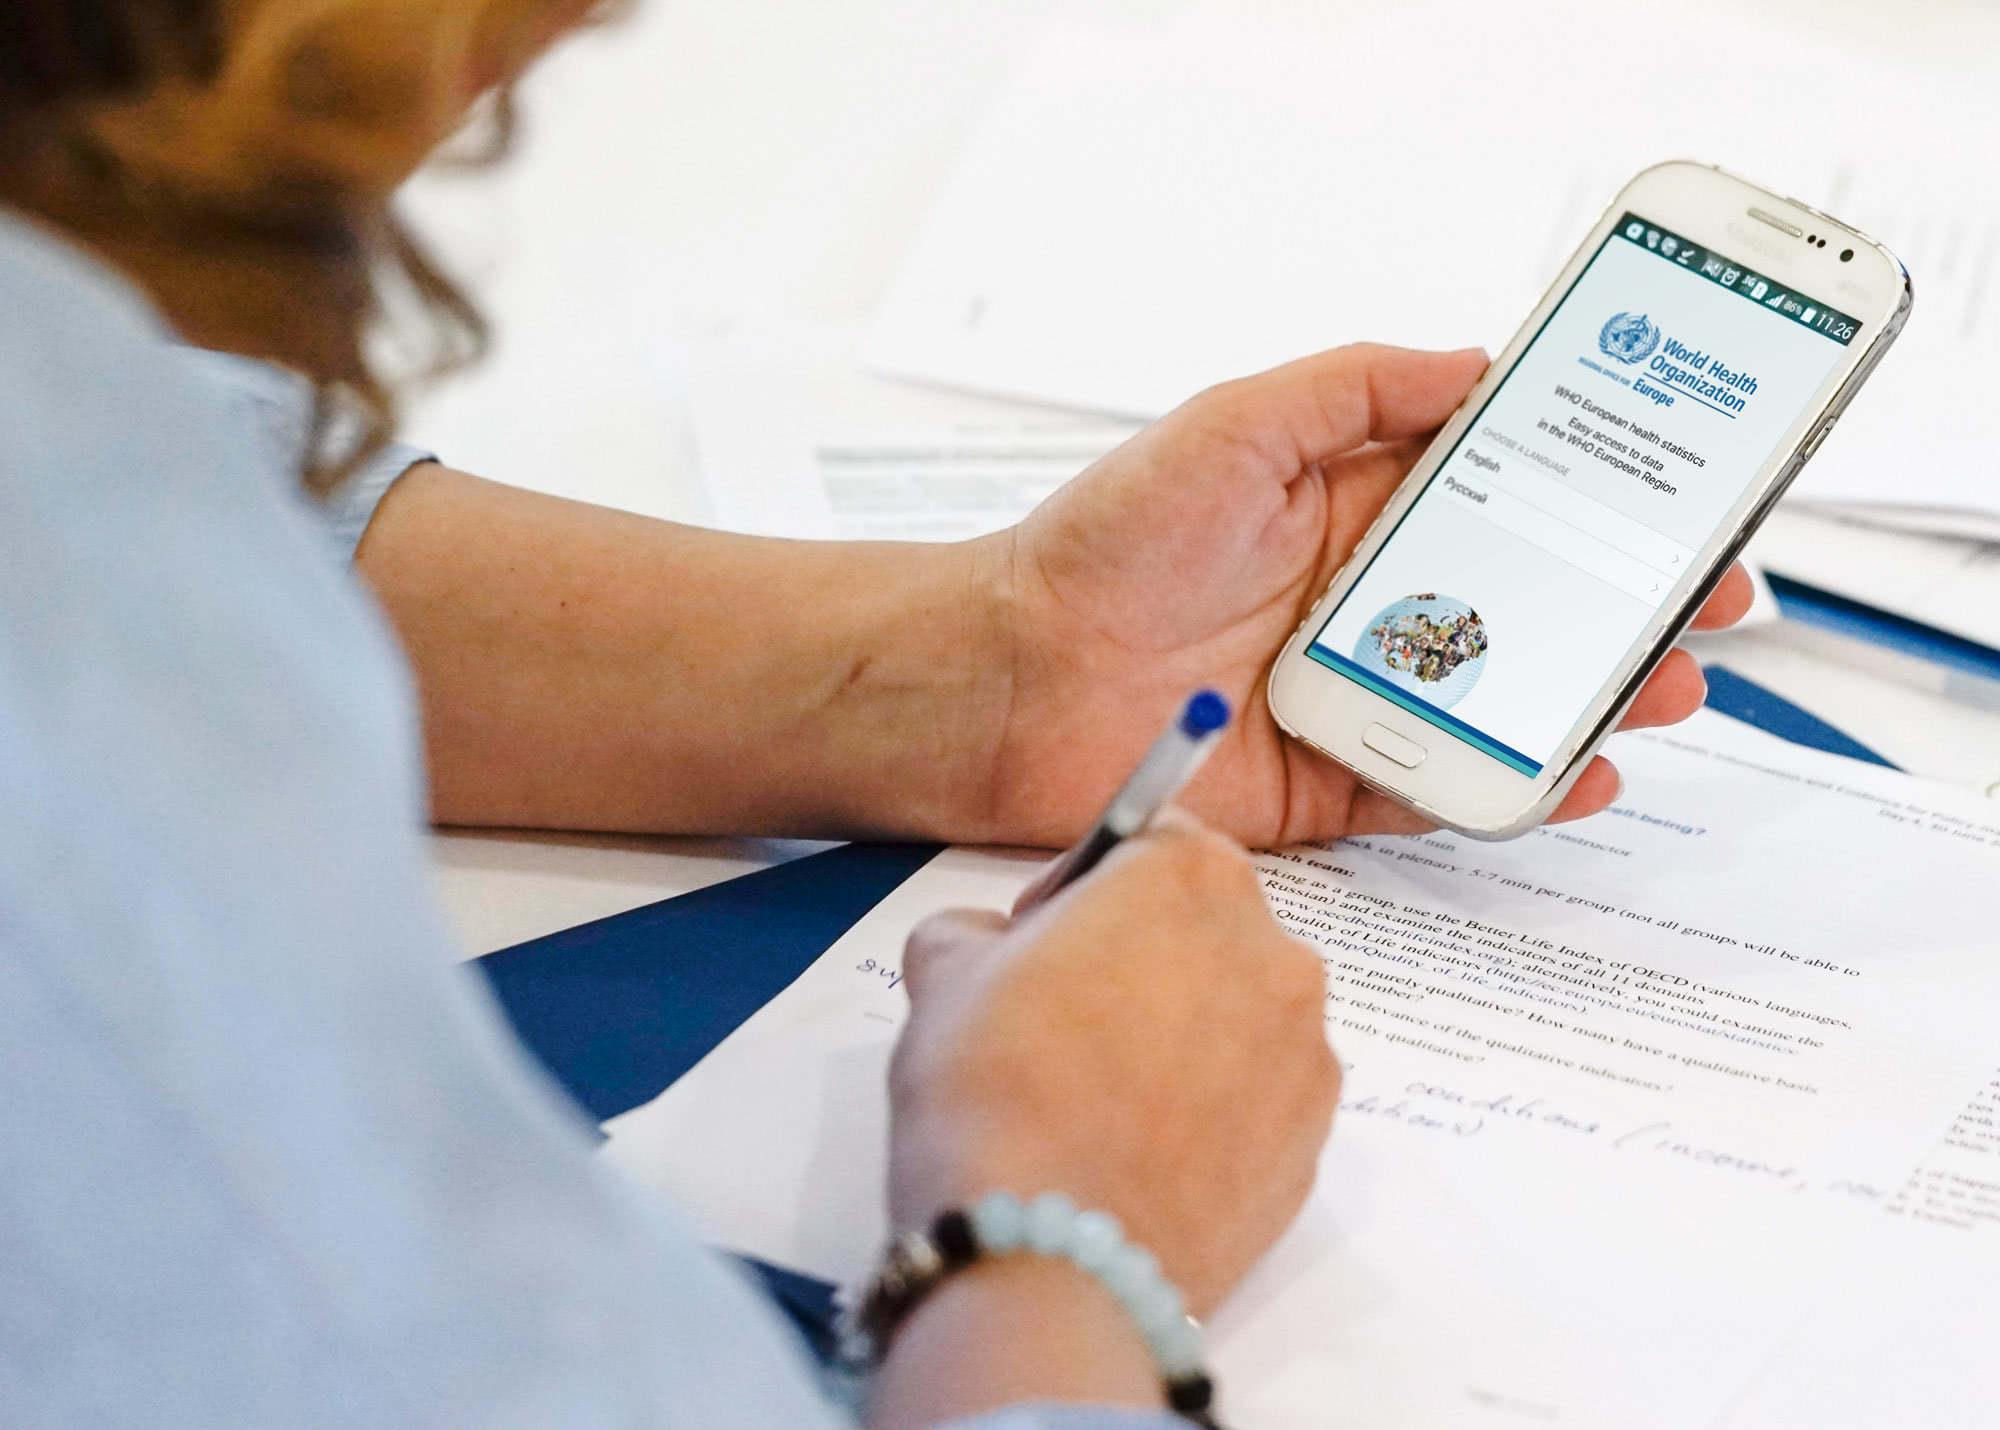 The WHO European Health Statistics mobile app